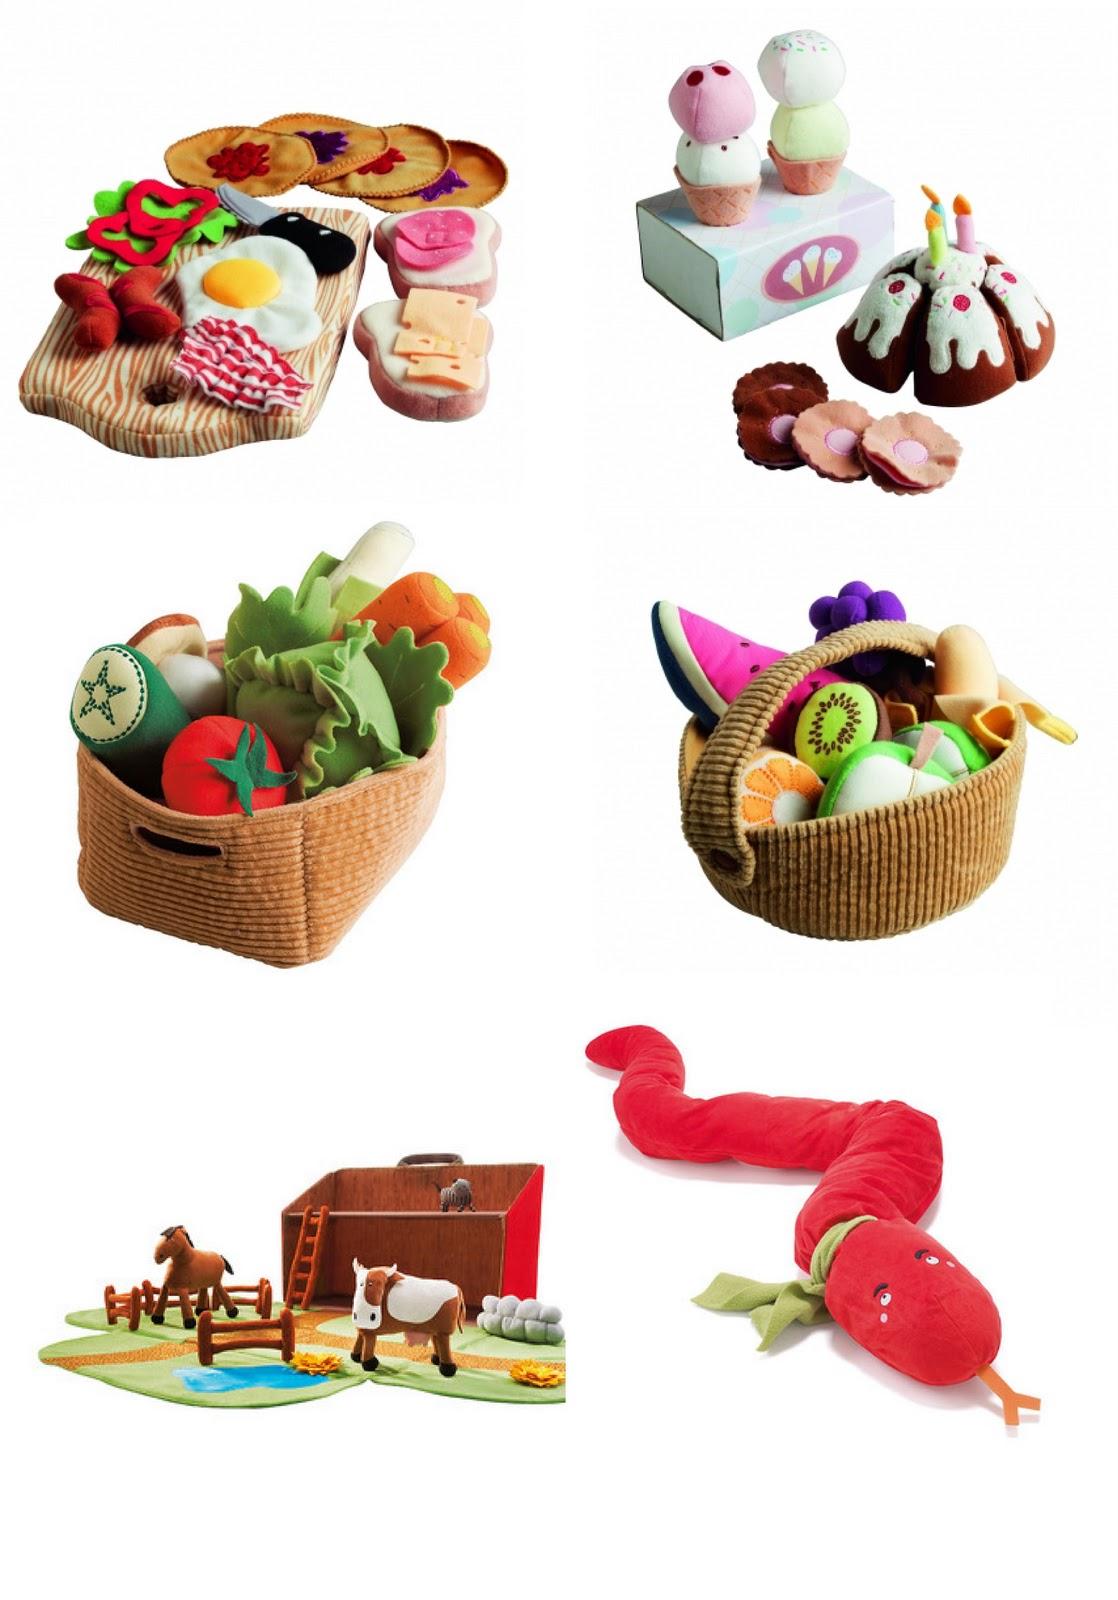 Descubre m s novedades del cat logo ikea 2011 ni os for Ikea ninos juguetes